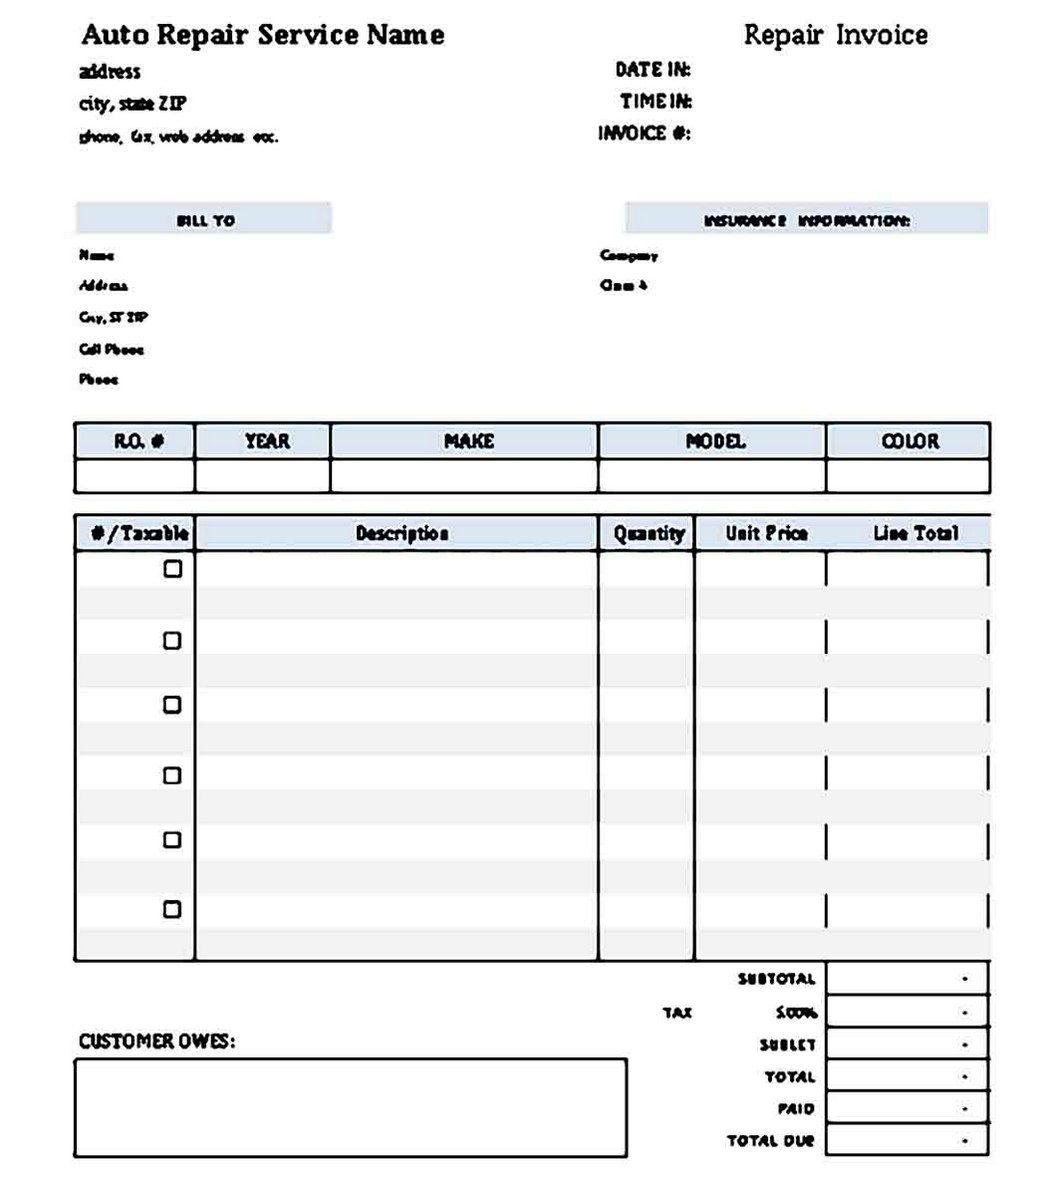 009 Archaicawful Microsoft Excel Auto Repair Invoice Template Idea Full